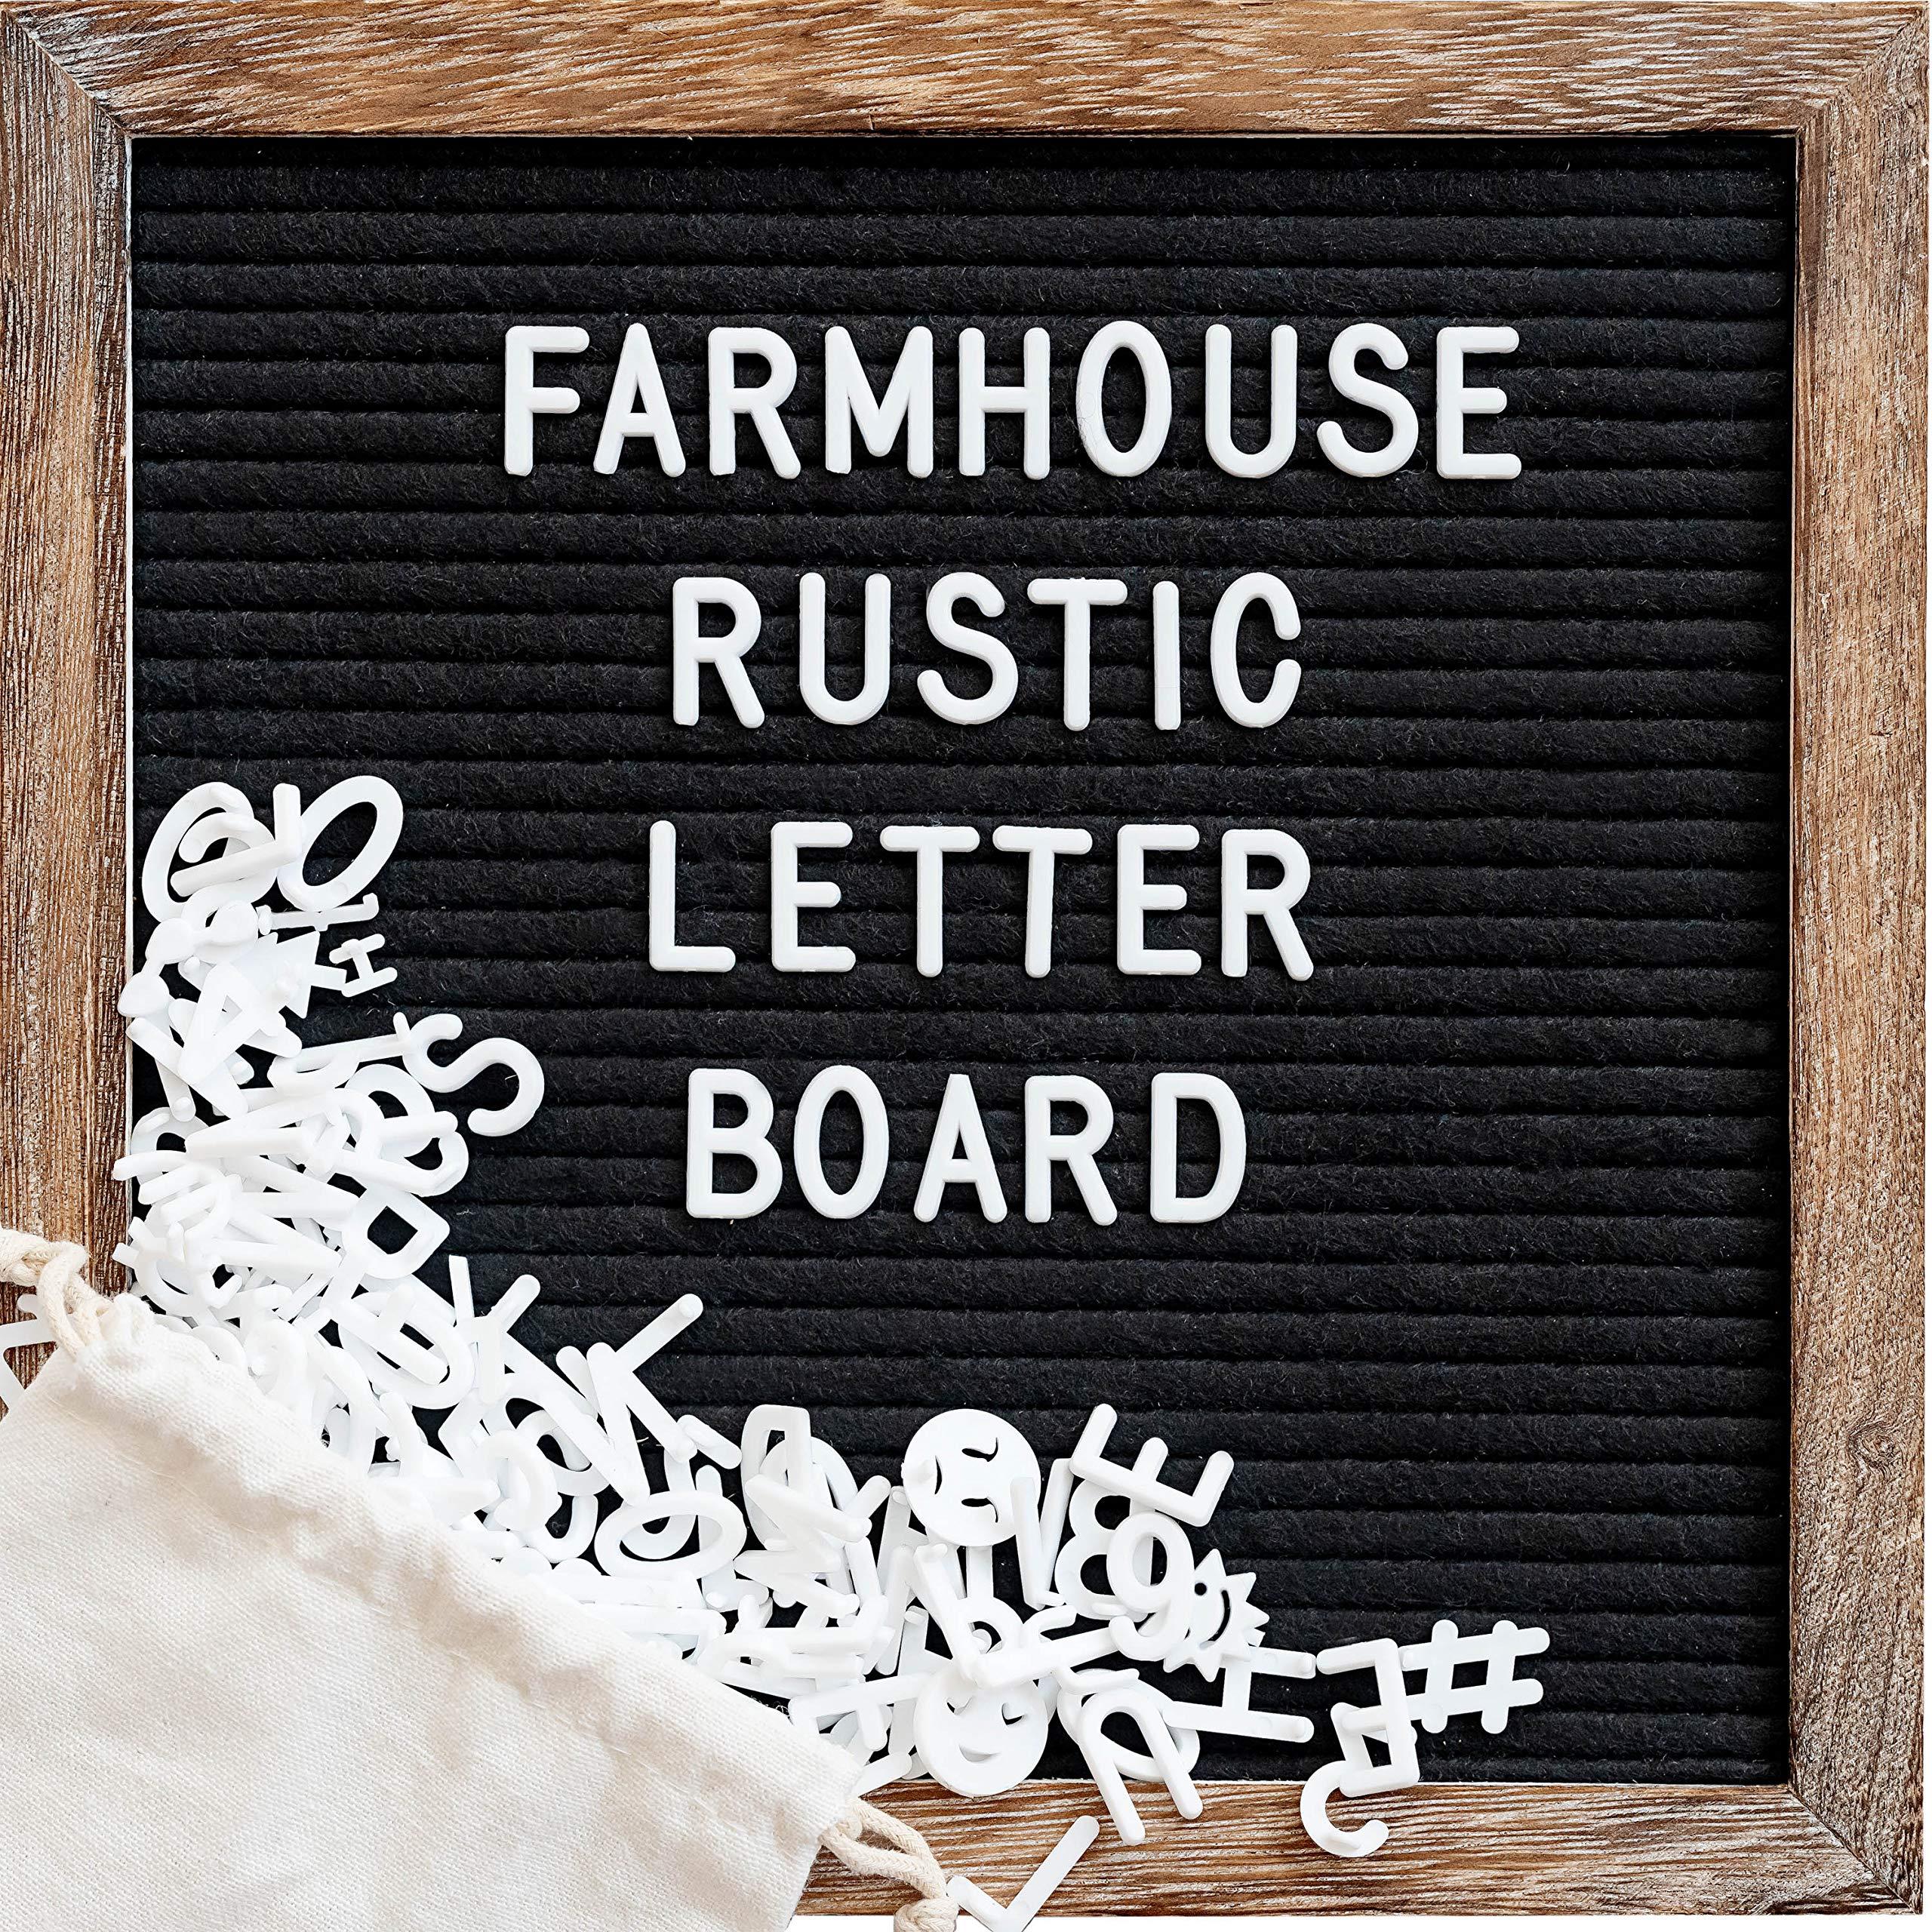 Felt Letter Board with 10x10 Inch Rustic Wood Frame, Script Words, Precut Letters, Picture Hangers | Farmhouse Wall Decor | Shabby Chic Vintage Decor | Black Felt Message Board